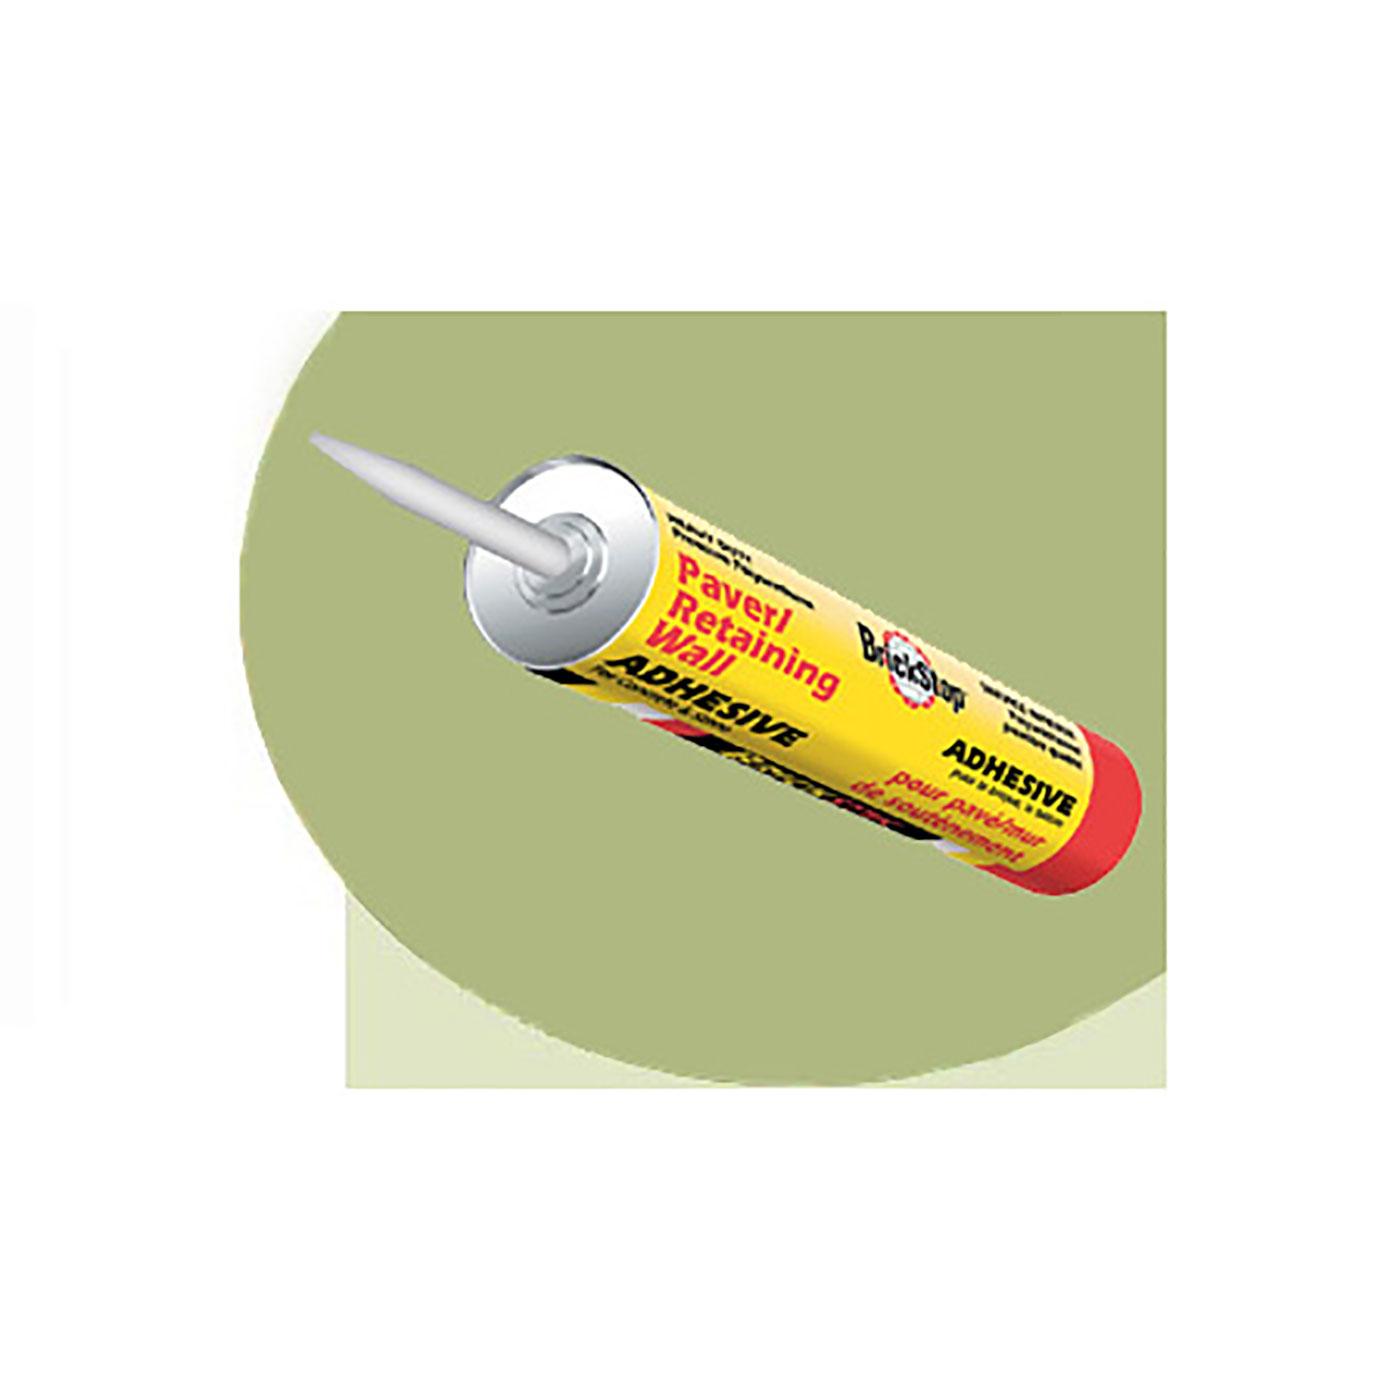 29 oz. BrickStik Premium Polyurethane Paver/Retaining Wall Adhesive